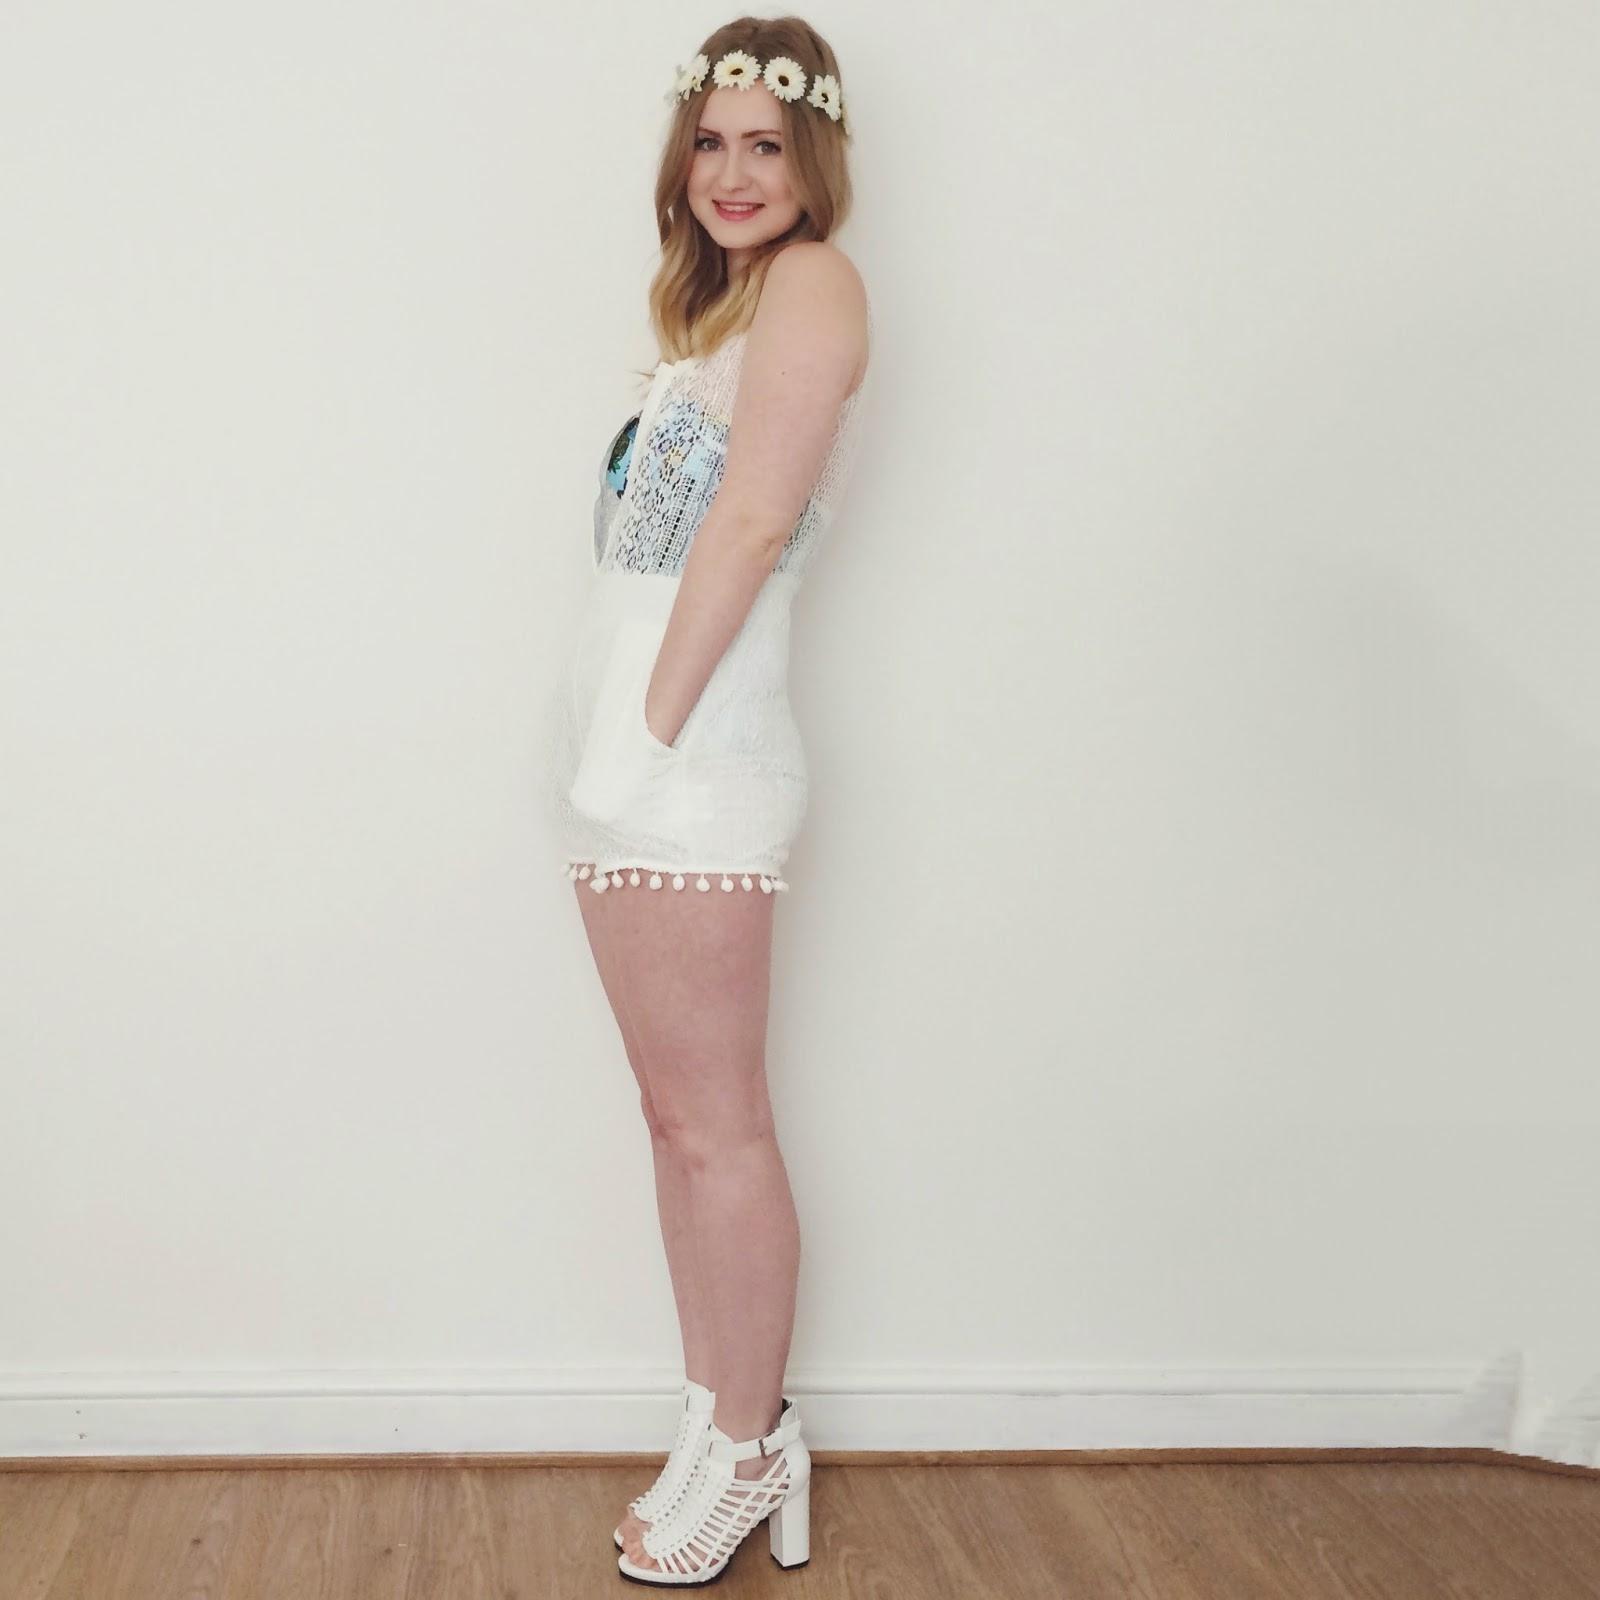 CelebLook review, festival fashion, fashion blogger